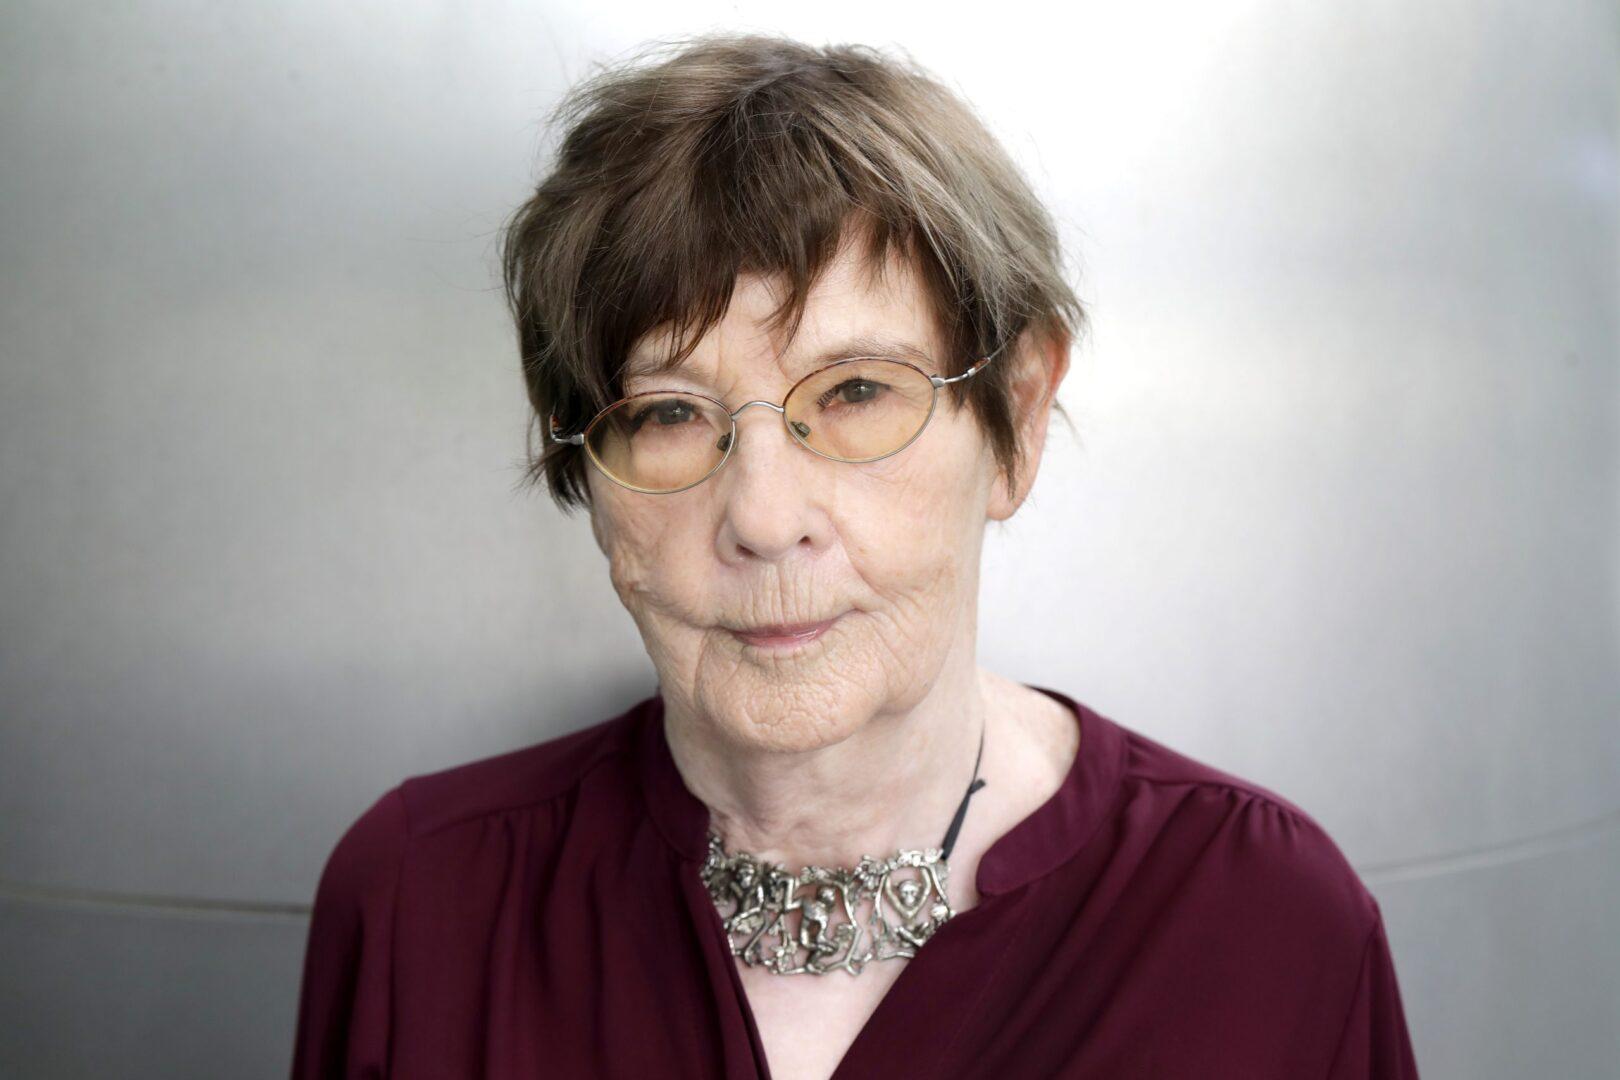 Krystyna Bobińska